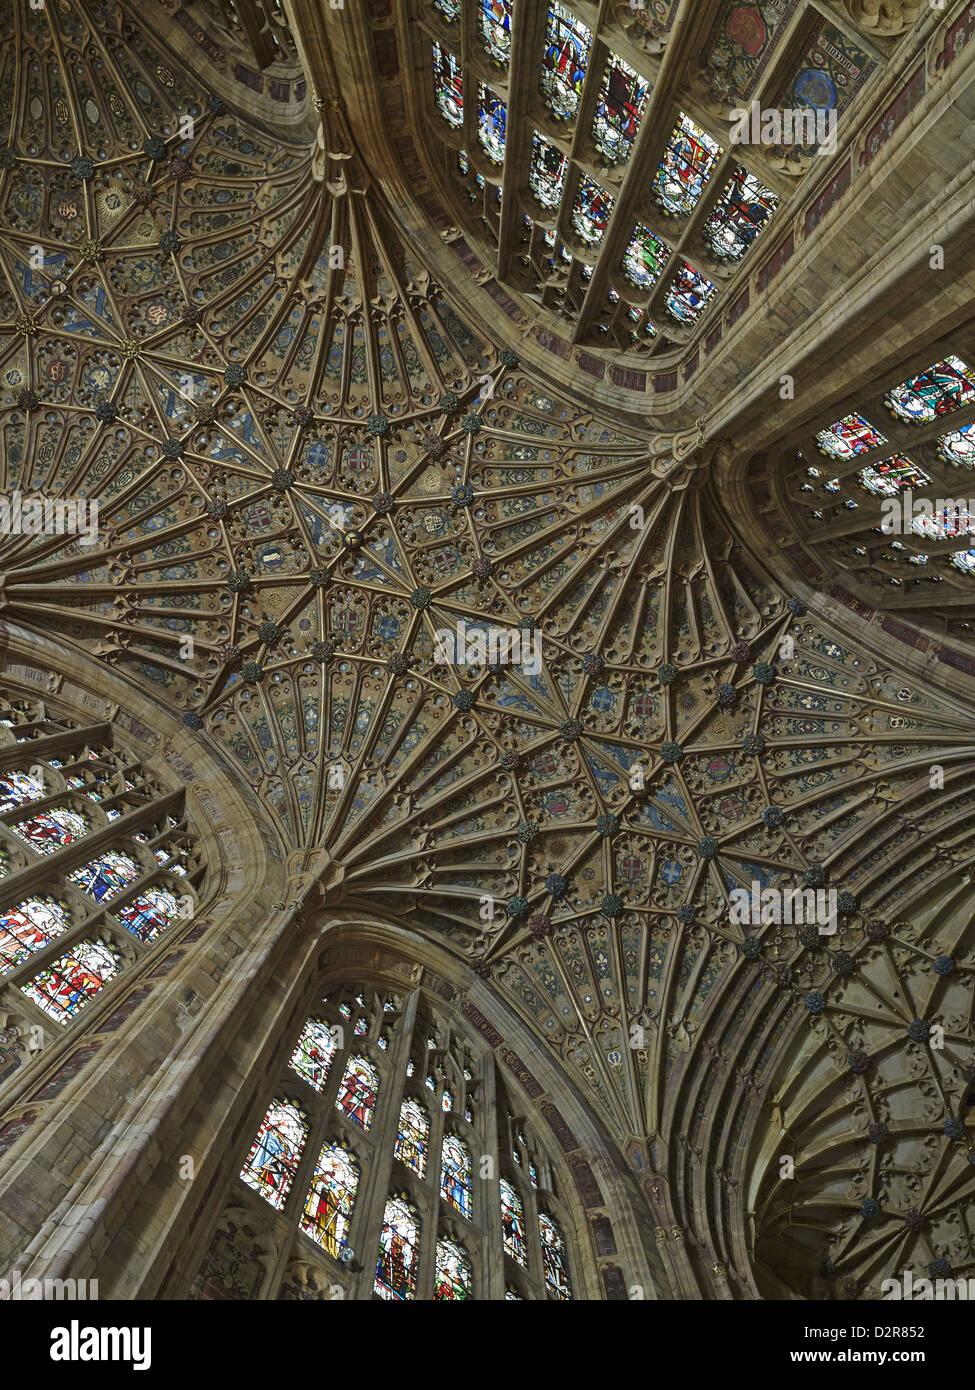 Sherborne Abbey, choir fan vaulting - Stock Image